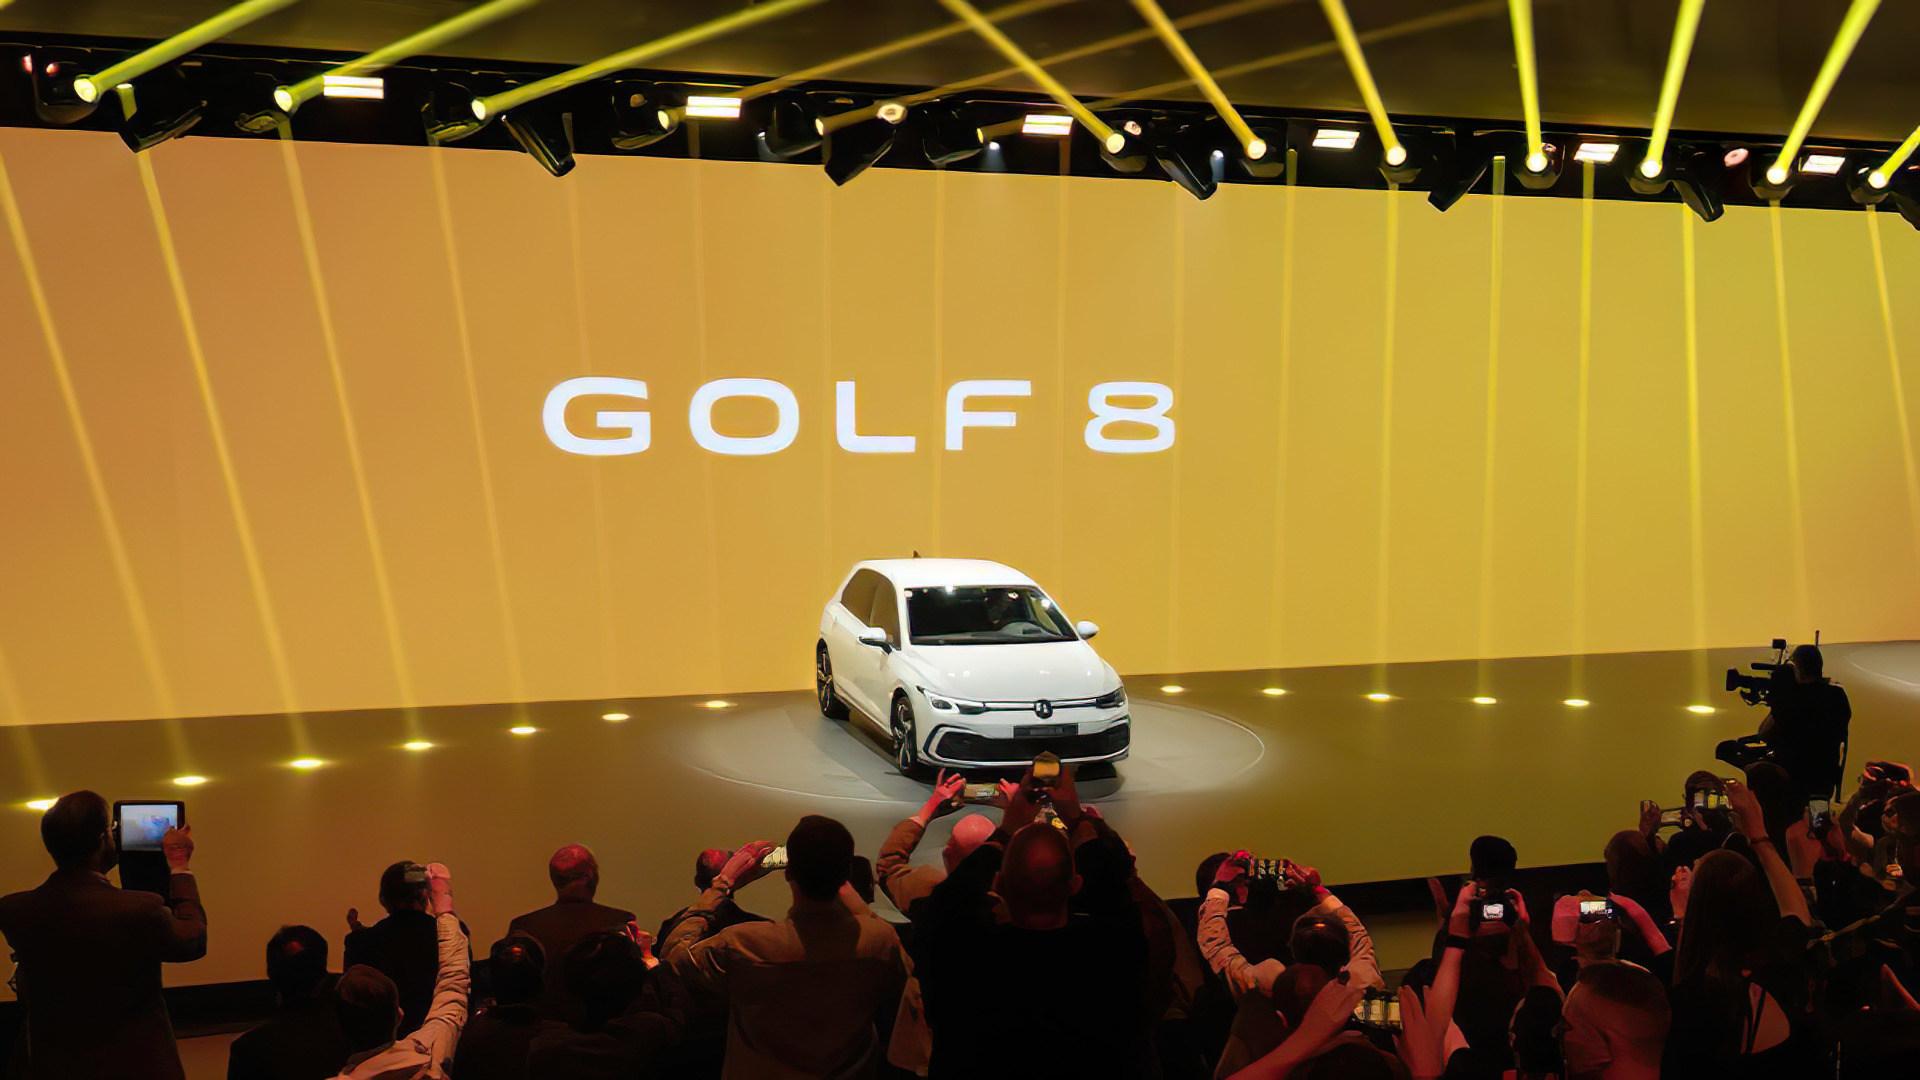 Software, Bug, Vw, volkswagen, golf, Golf 8